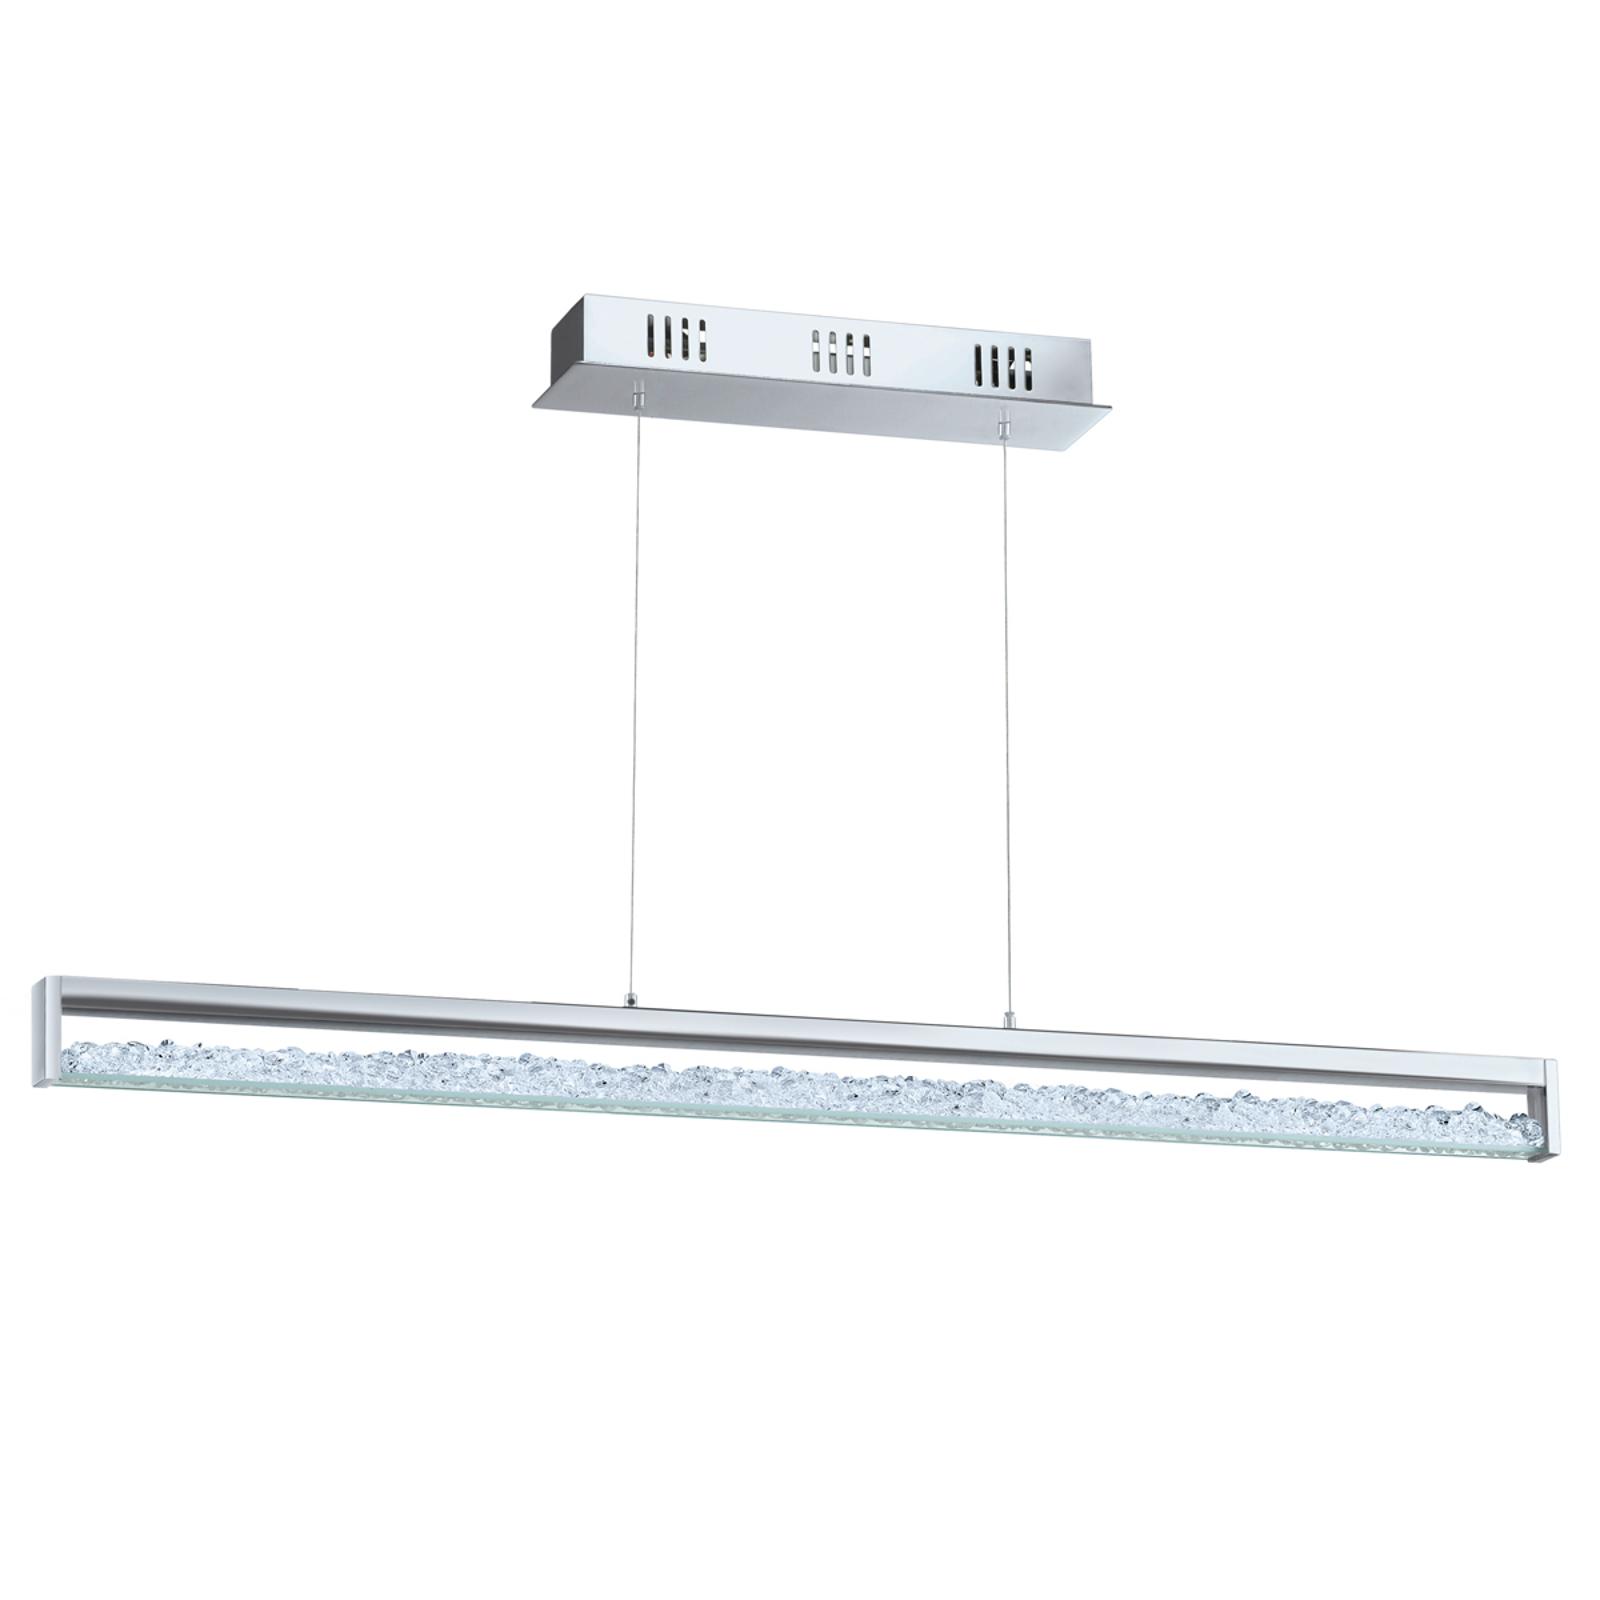 Závesné LED svietidlo Cardito krištáľ Asfour 100cm